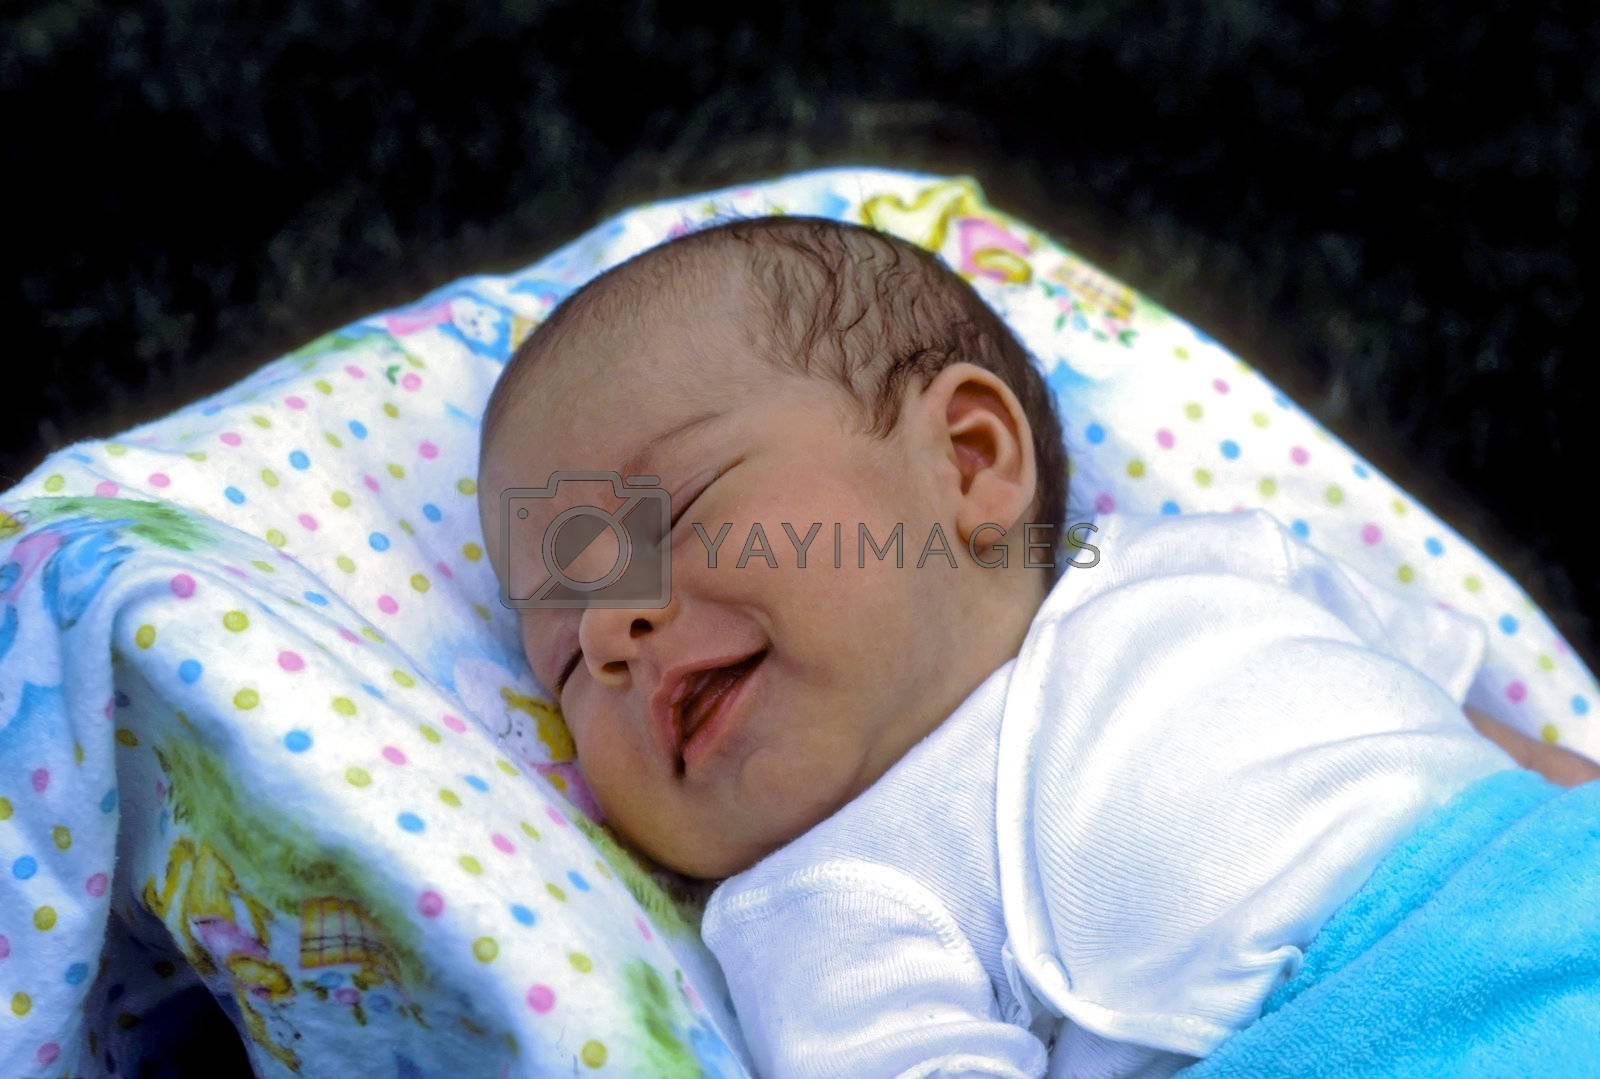 Newborn baby smiling in his sleep.